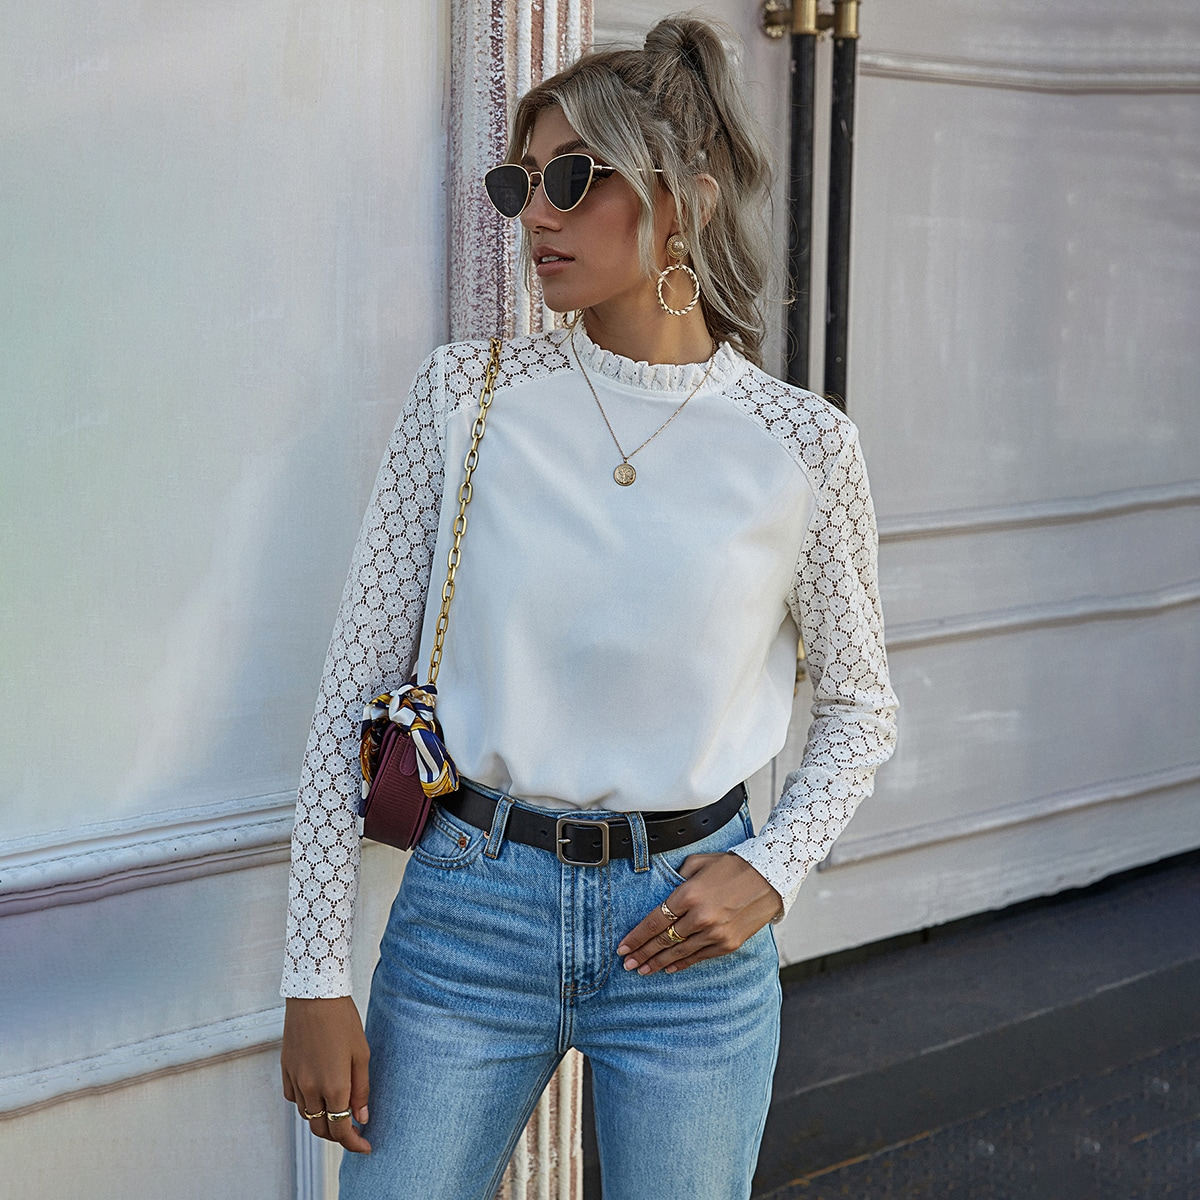 Блузка с кружевным рукавом